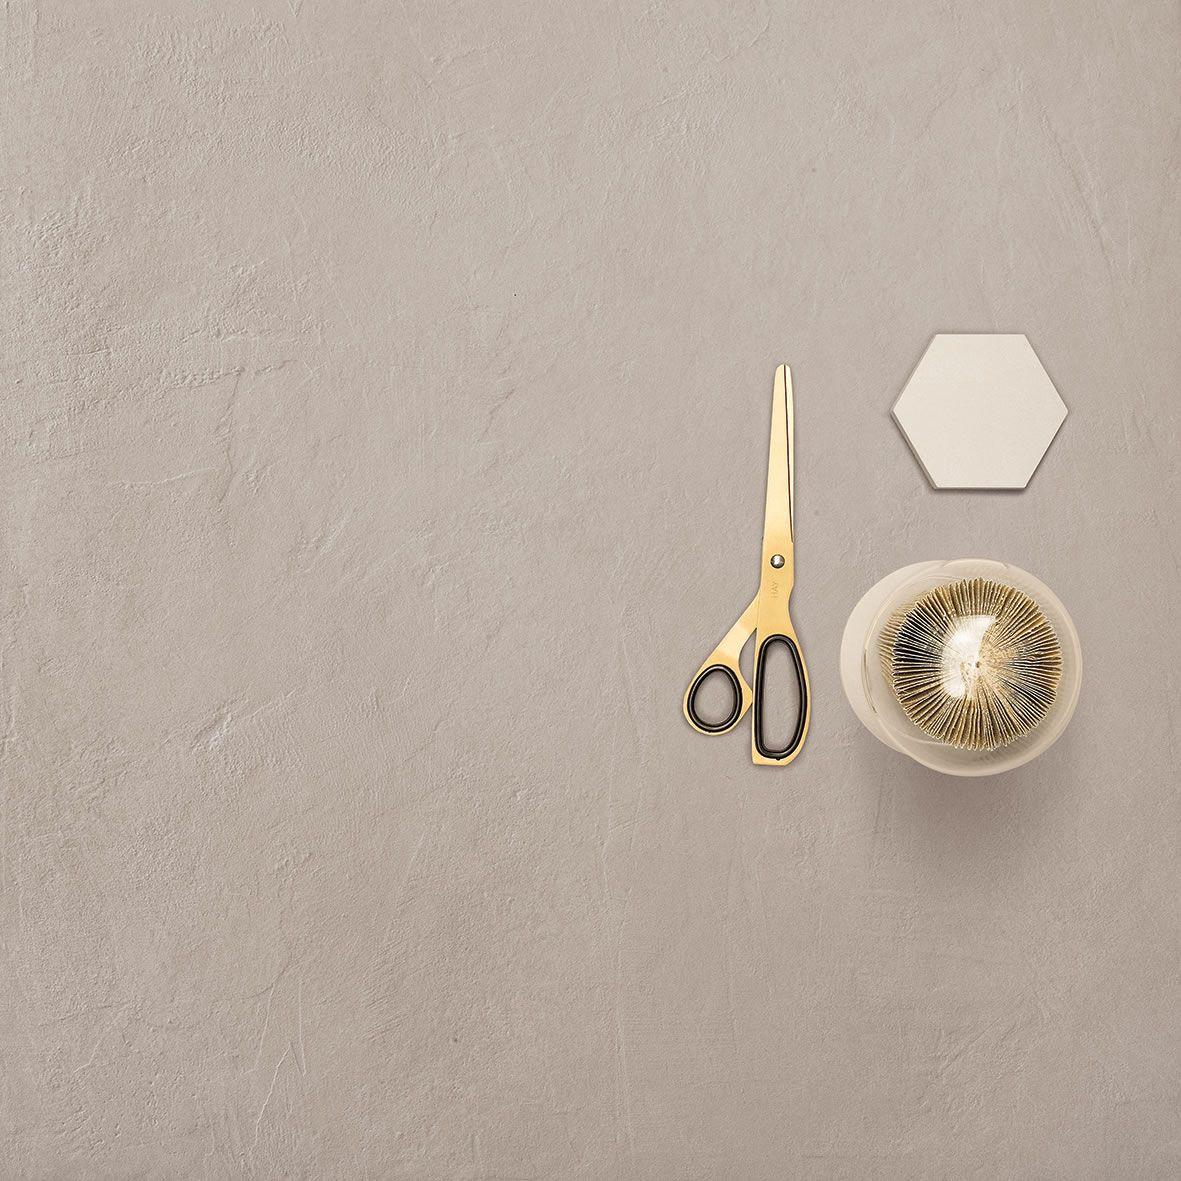 Kronos Trellis Solid White 60x60 Cm 7204 Porcelain Stoneware Decor 60x60 On Bathroom39 Com At 43 Euro Sqm T Solid White Trellis Accessories Design